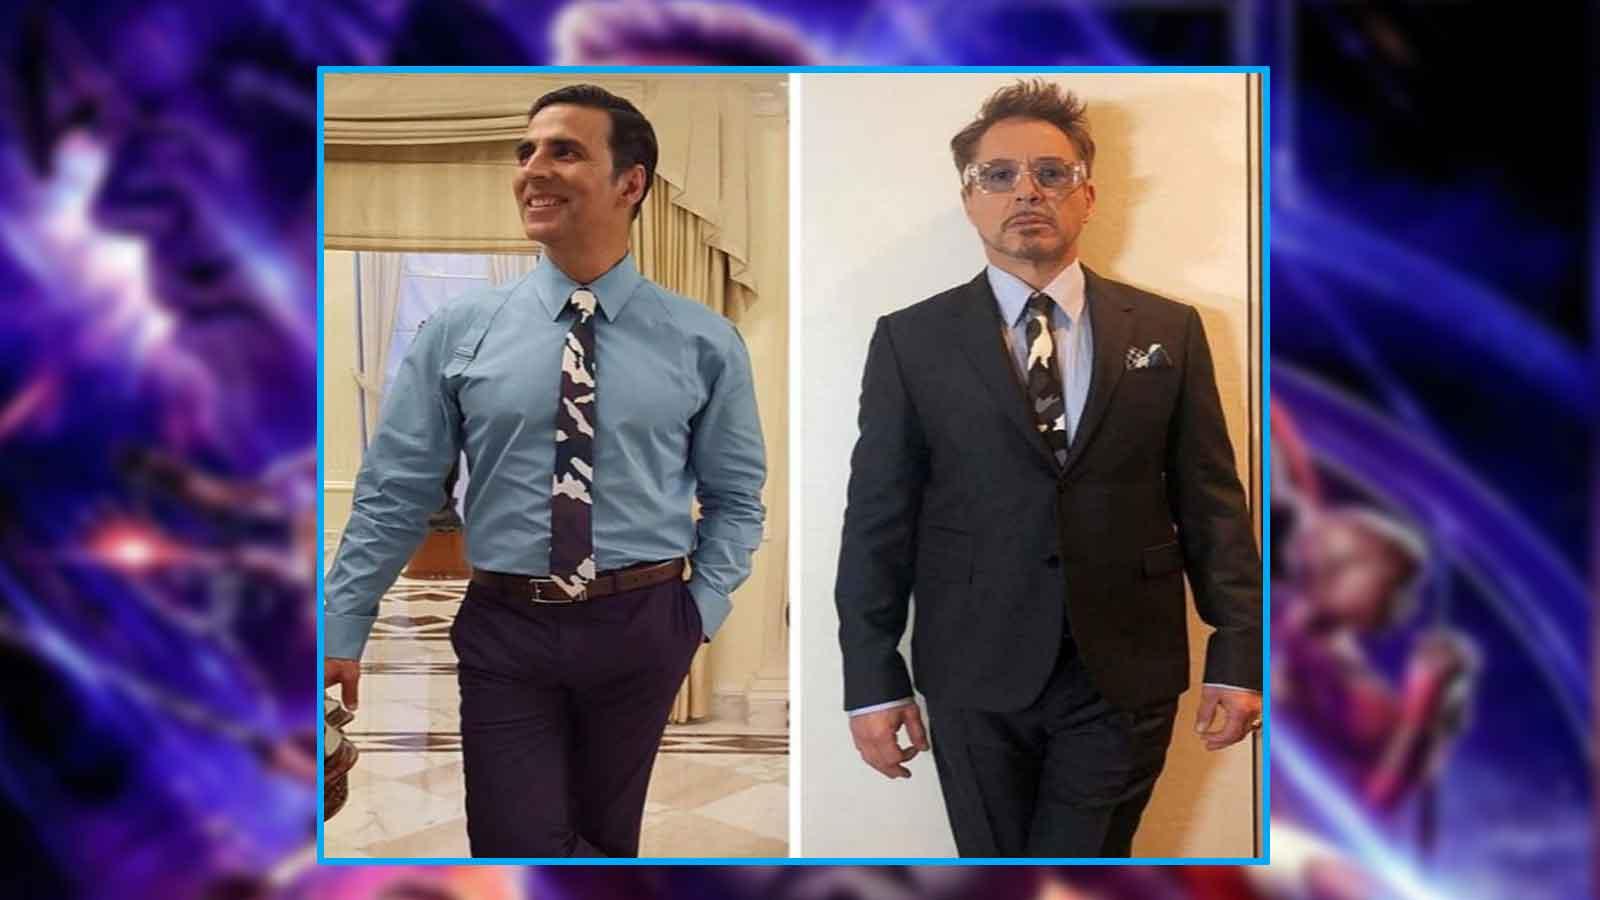 Akshay Kumar dons same tie as Robert Downey Jr aka Iron Man, asks fans 'who wore it better'